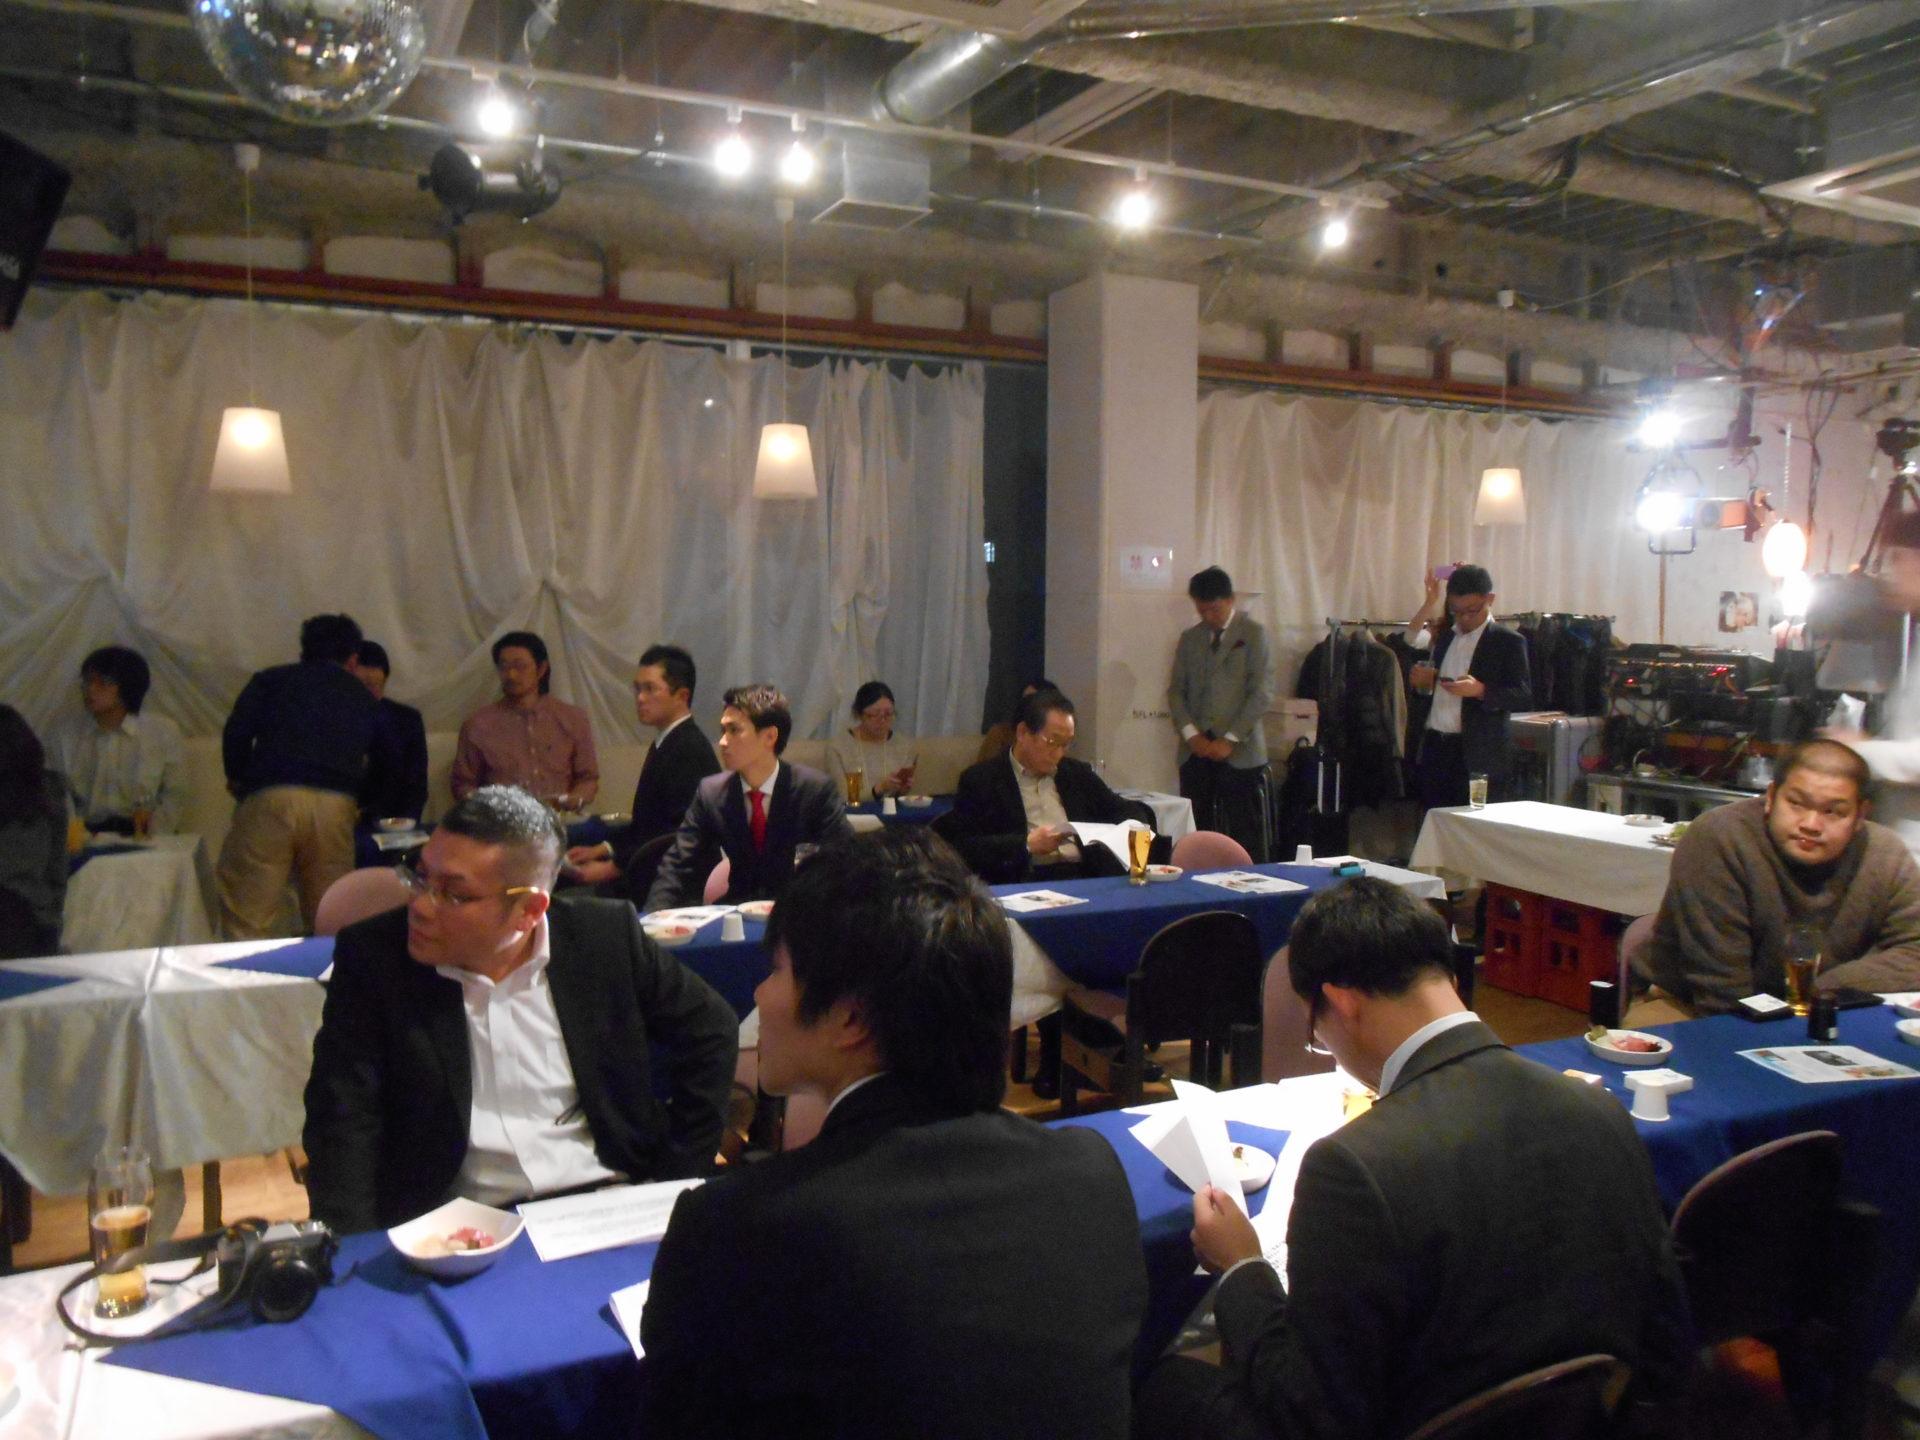 DSCN1055 1920x1440 - 2016年3月11日(金)AOsuki総会&パーティー開催しました。